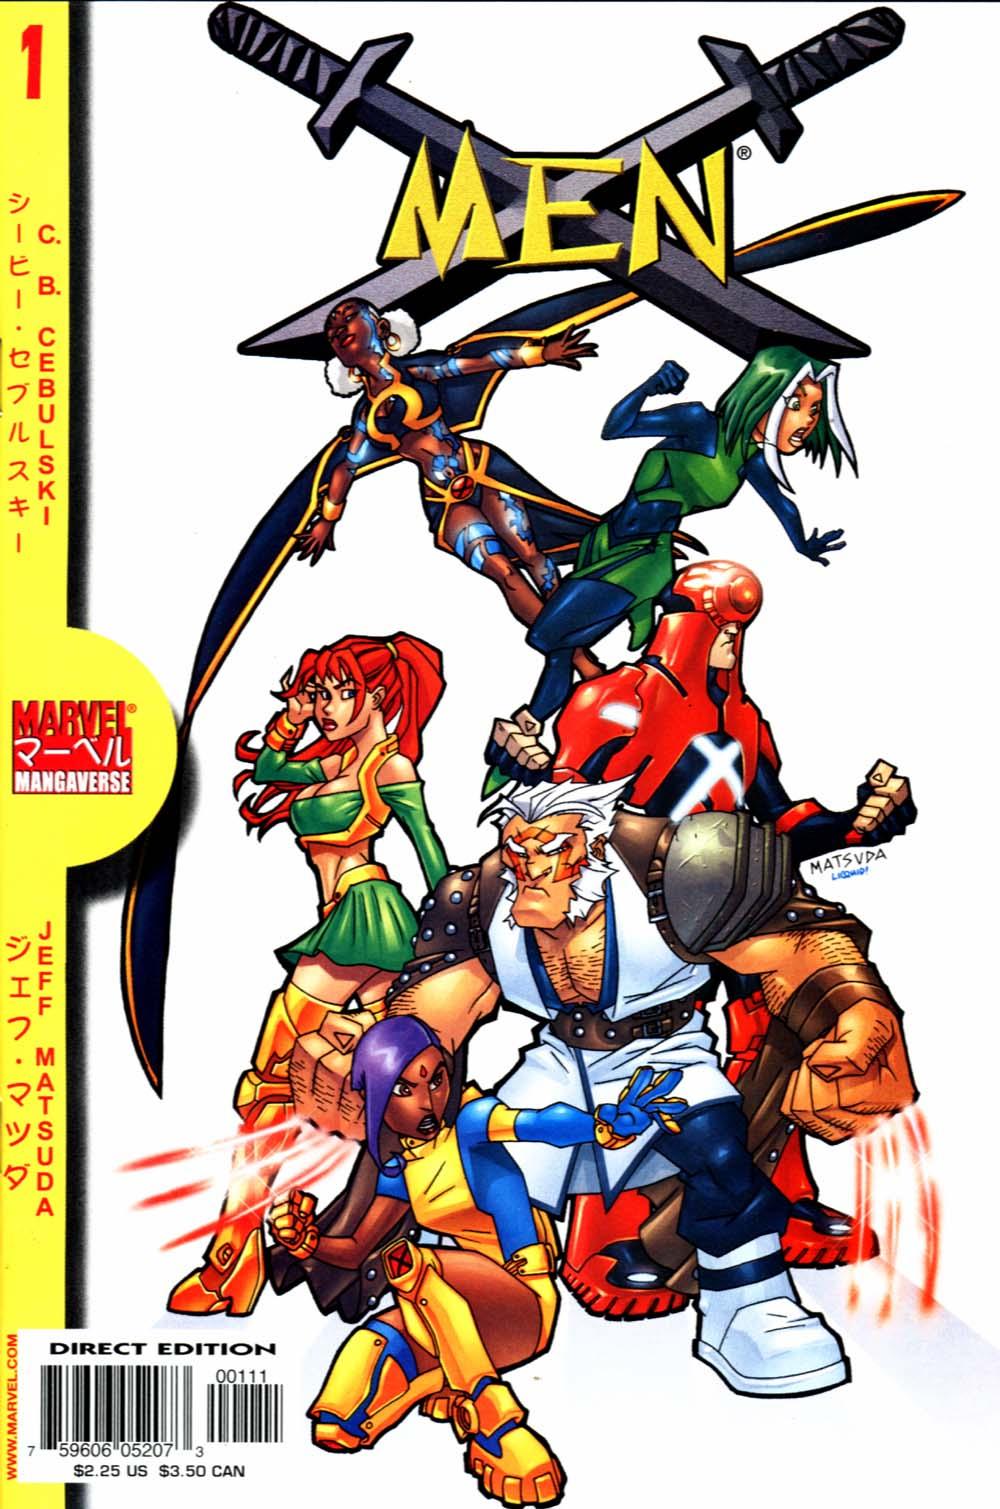 Marvel Mangaverse: X-Men Full Page 1